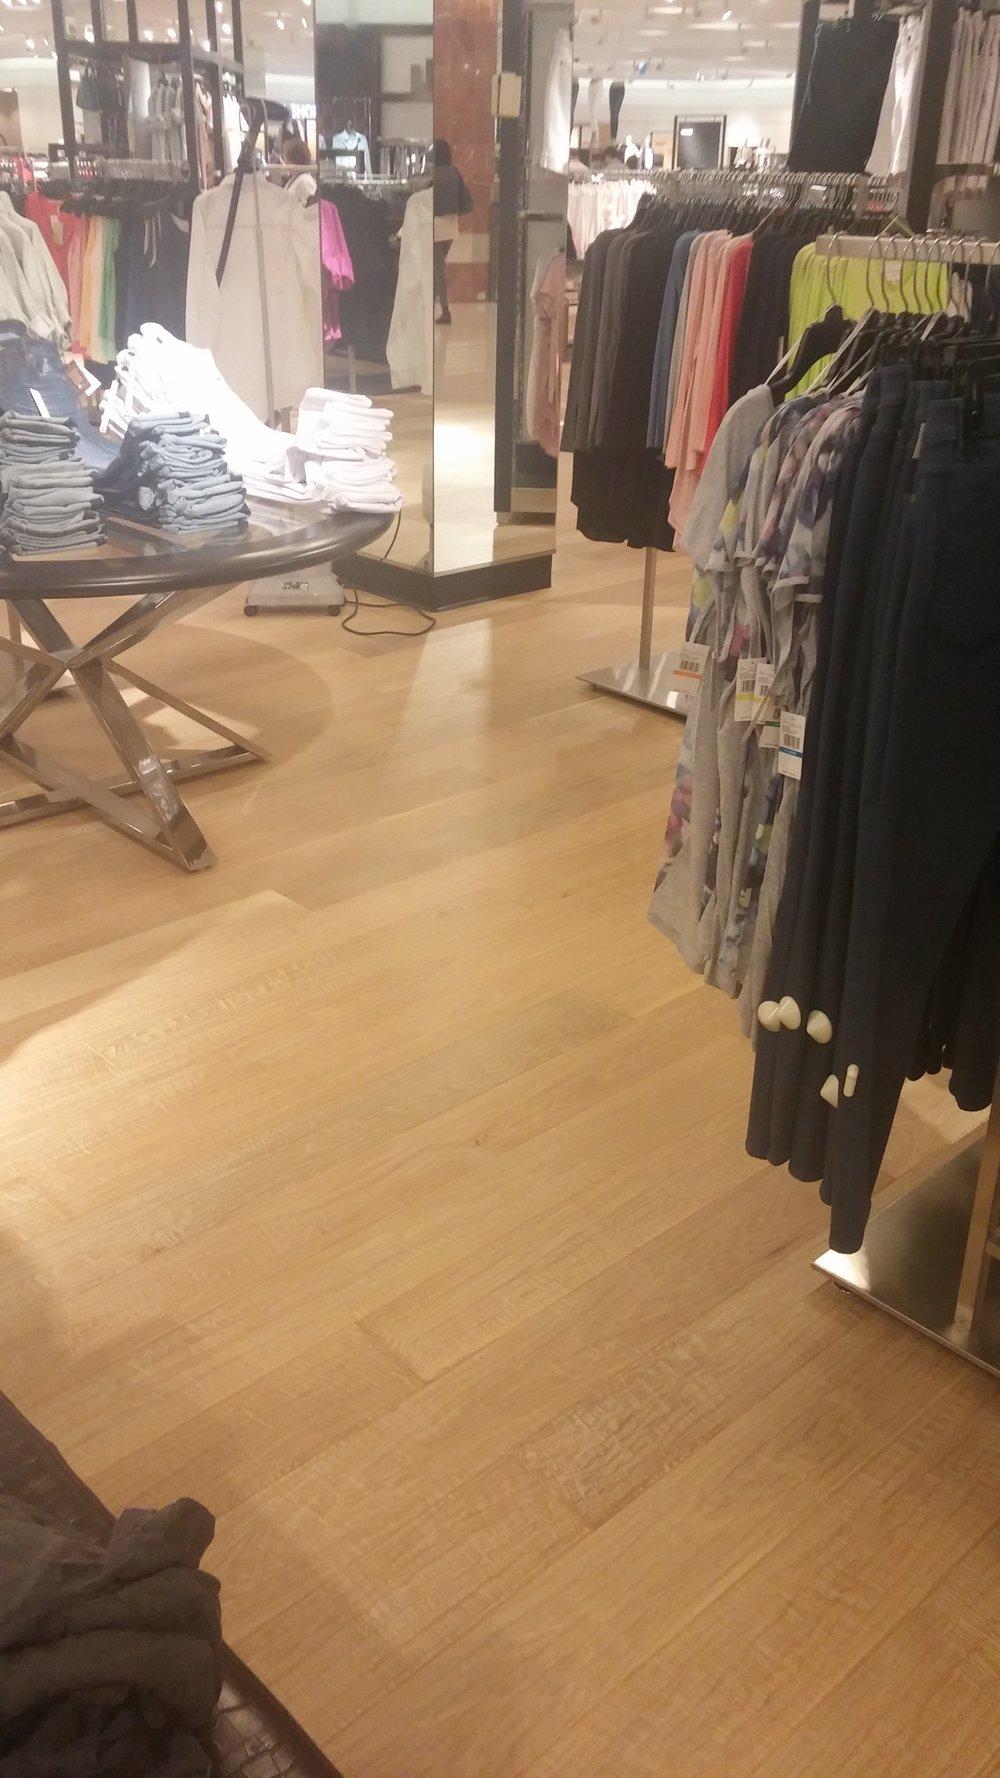 Major Retail-0014.jpg